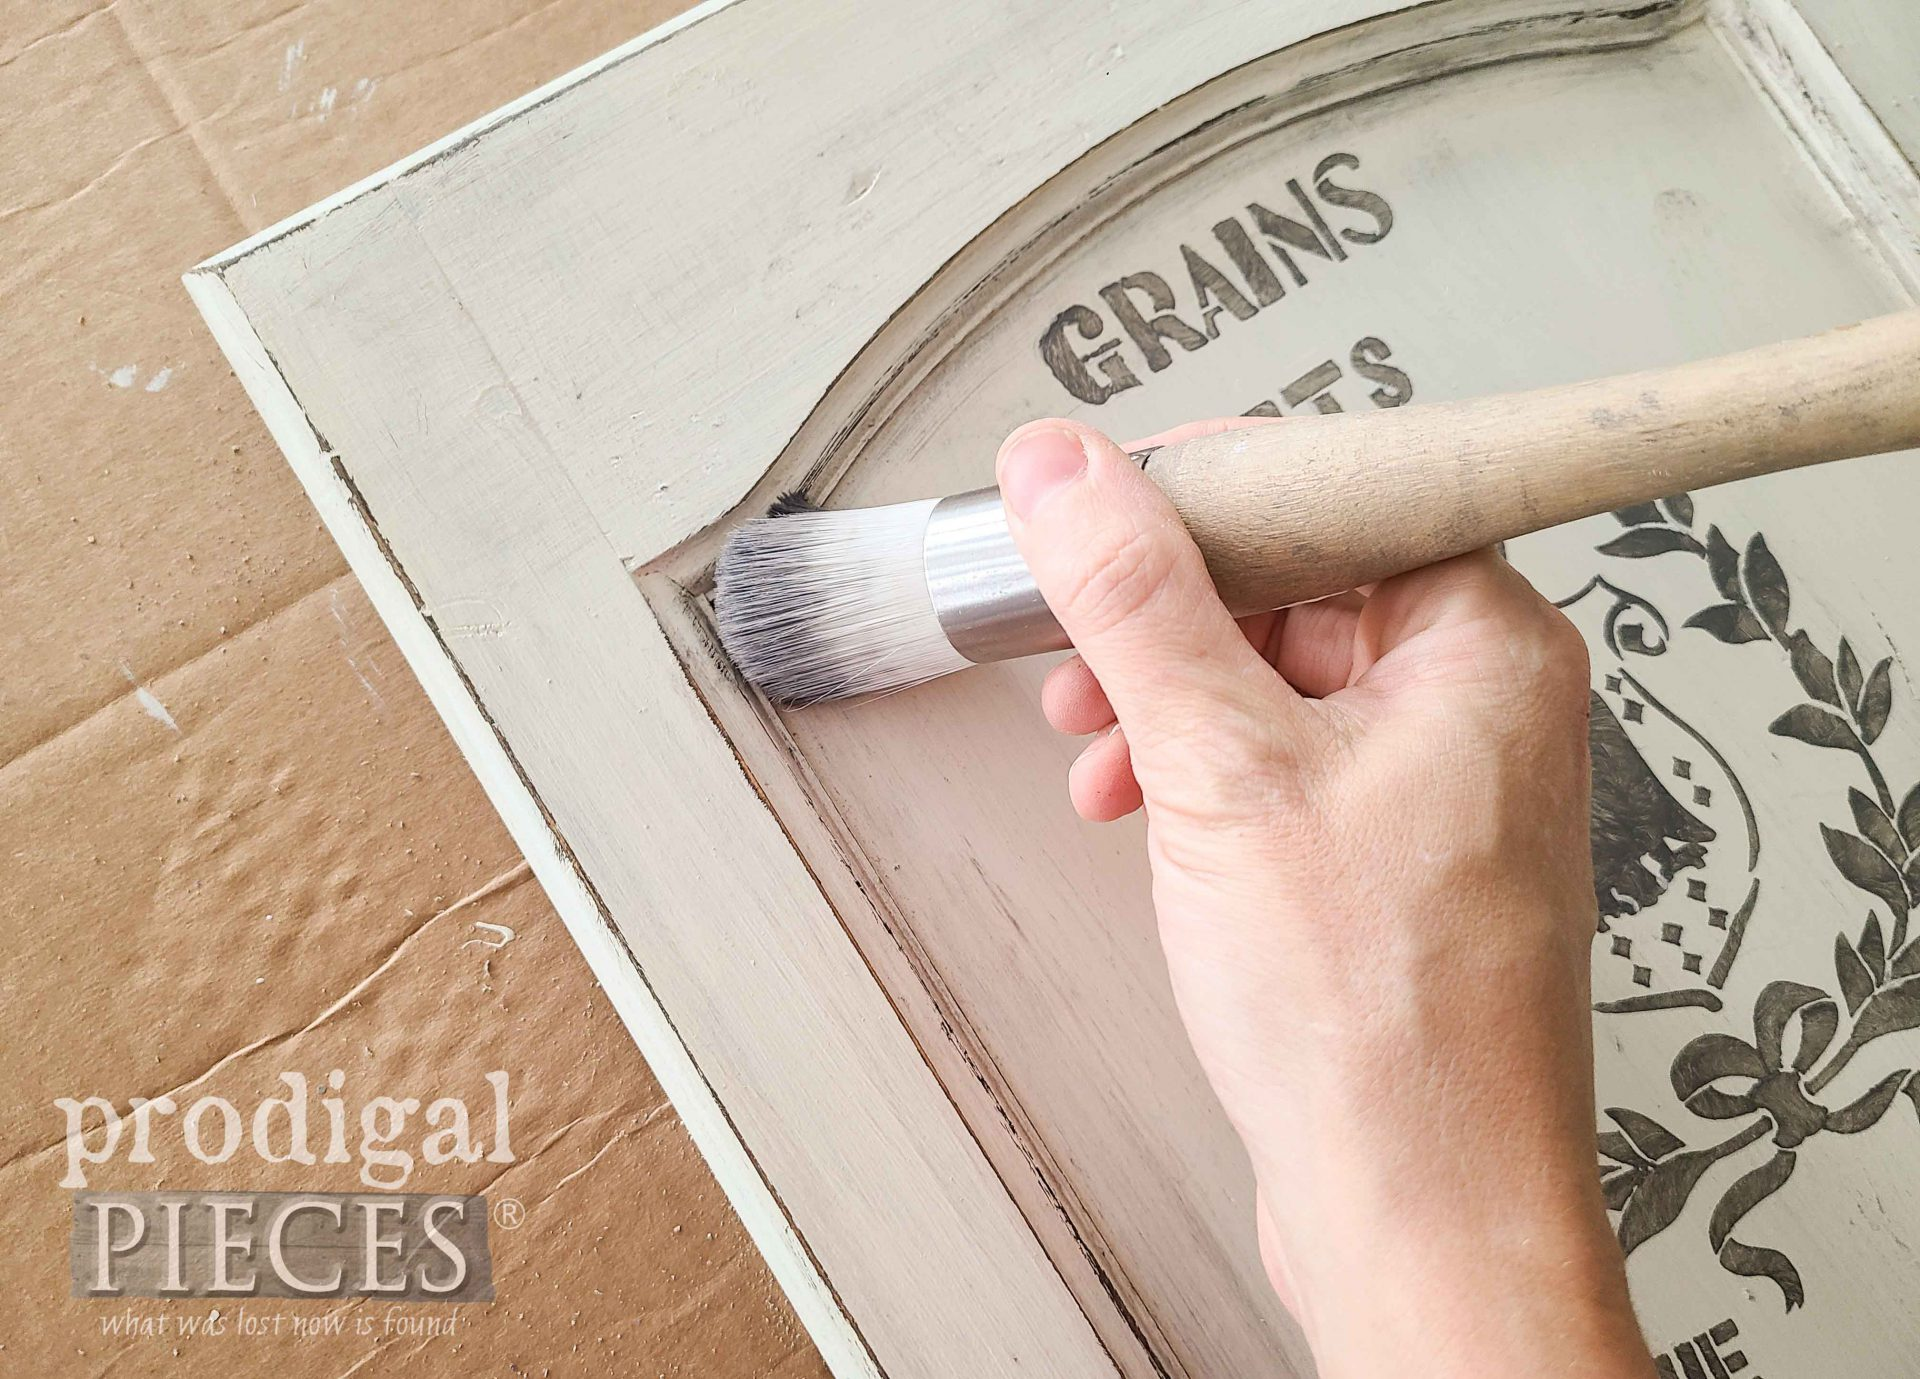 Waxing Cupboard Door with Gray Wax by Prodigal Pieces | prodigalpieces.com #prodigalpieces